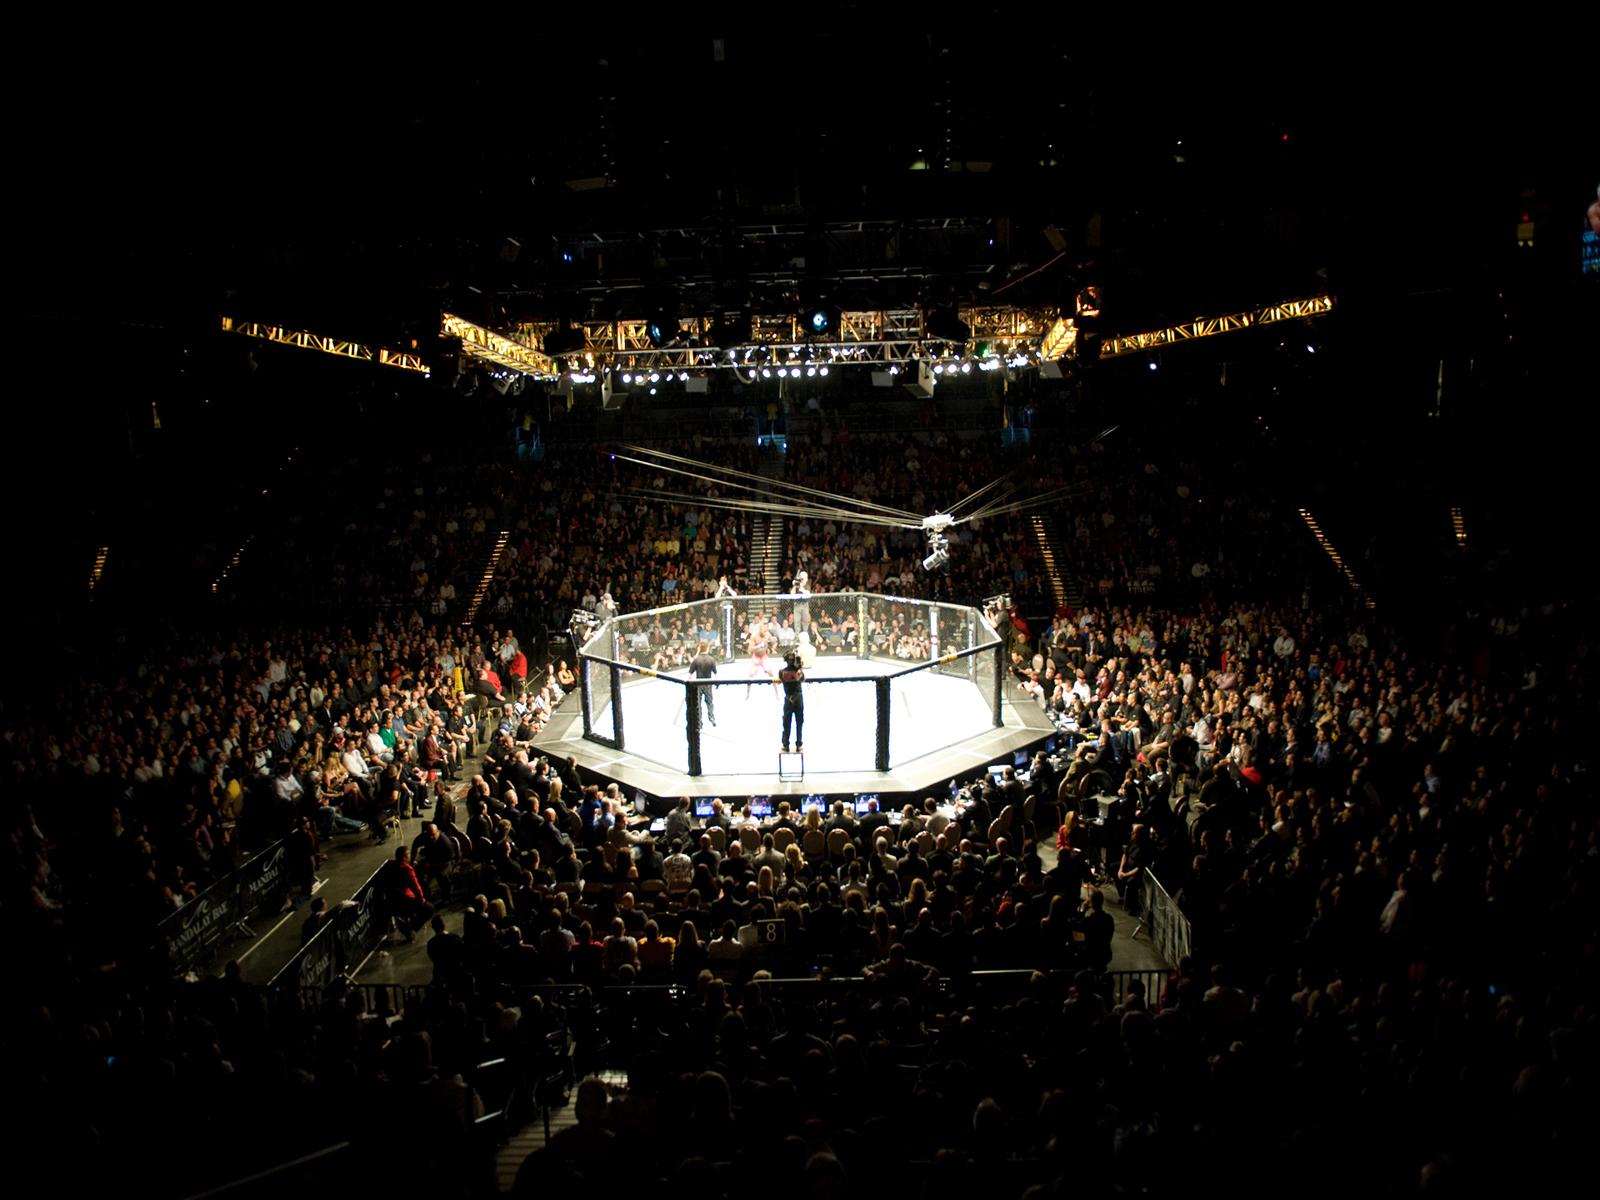 UFC 117 UFC Fight Card computer desktop wallpapers pictures 1600x1200